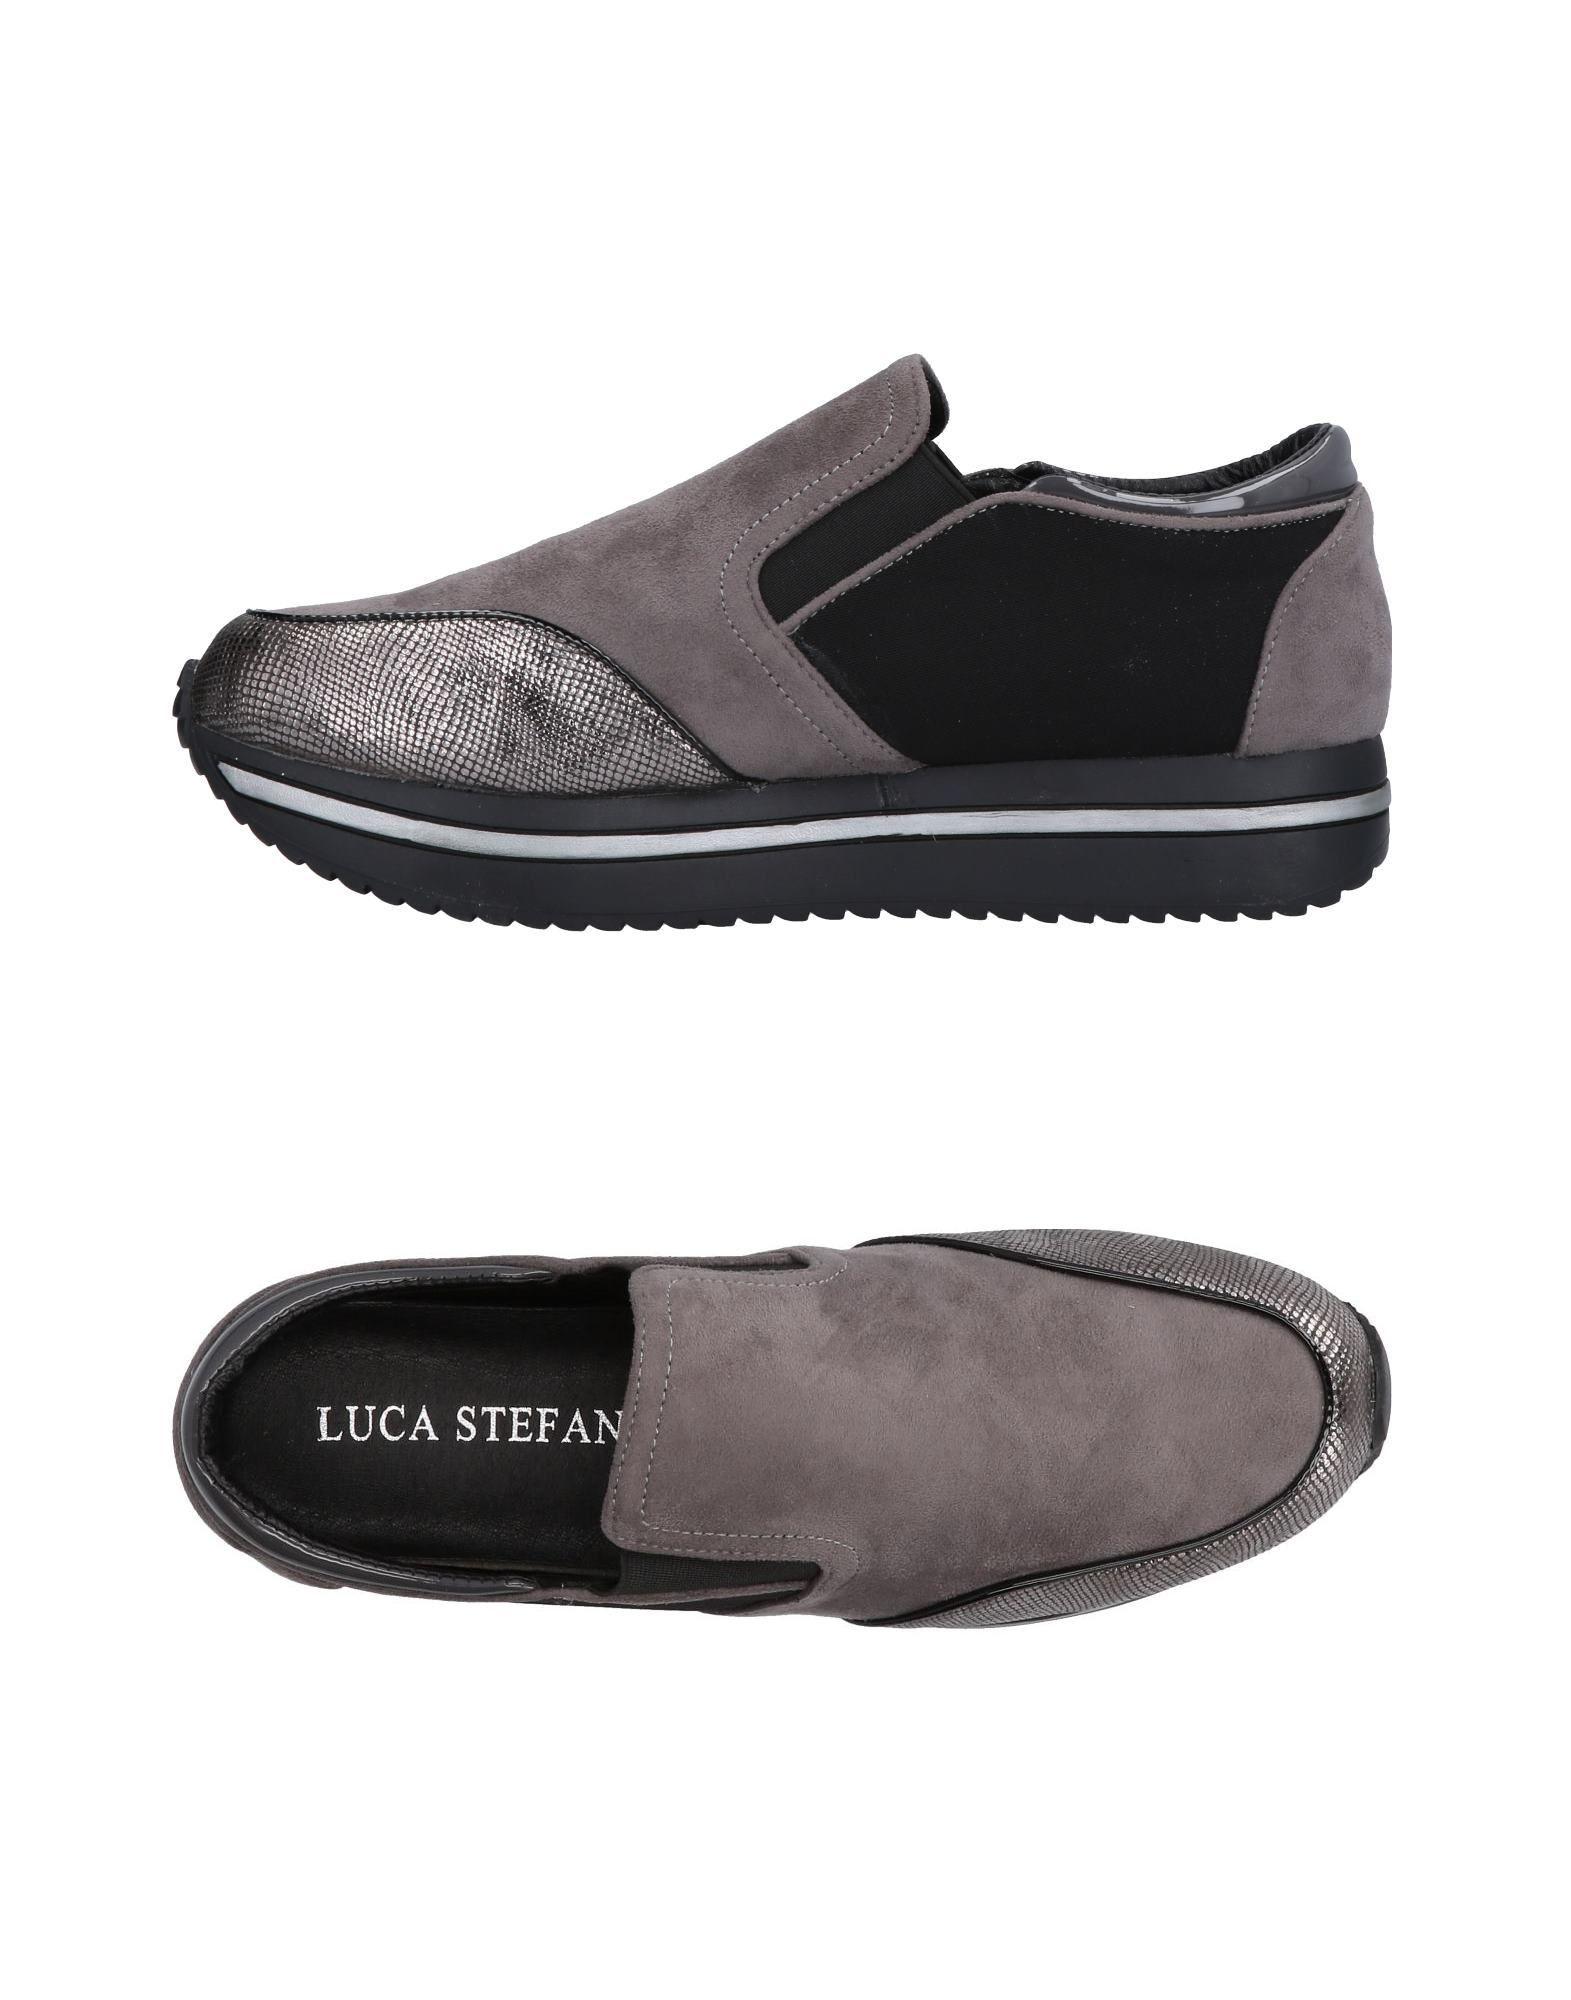 Sneakers Luca Stefani Donna Donna Stefani - 11475640FC 1caaba